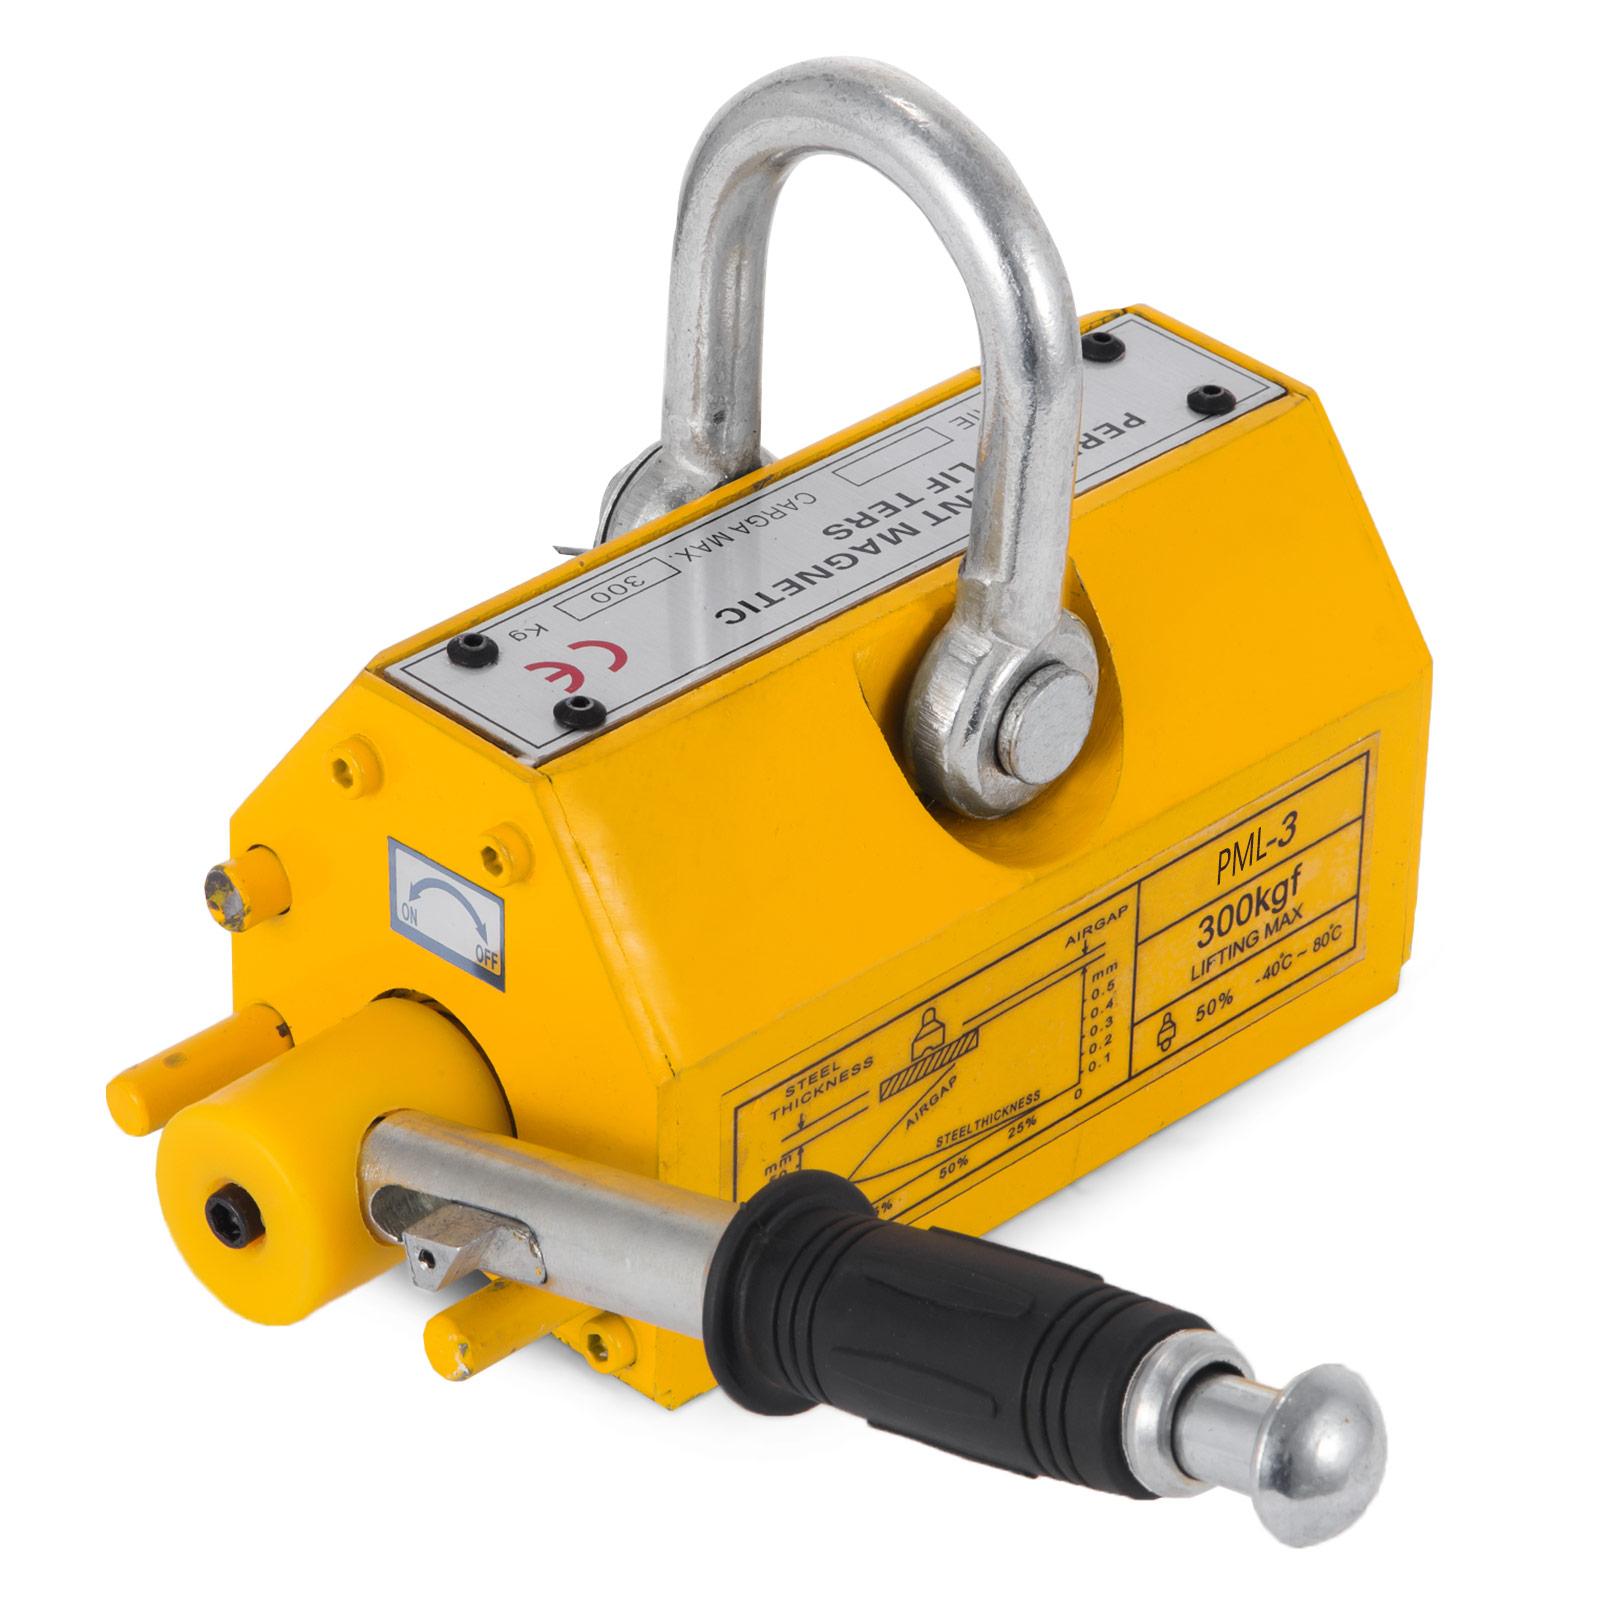 100-300-600-1000KG-Steel-Magnetic-Lifter-Heavy-Duty-Crane-Hoist-Lifting-Magnet miniature 28